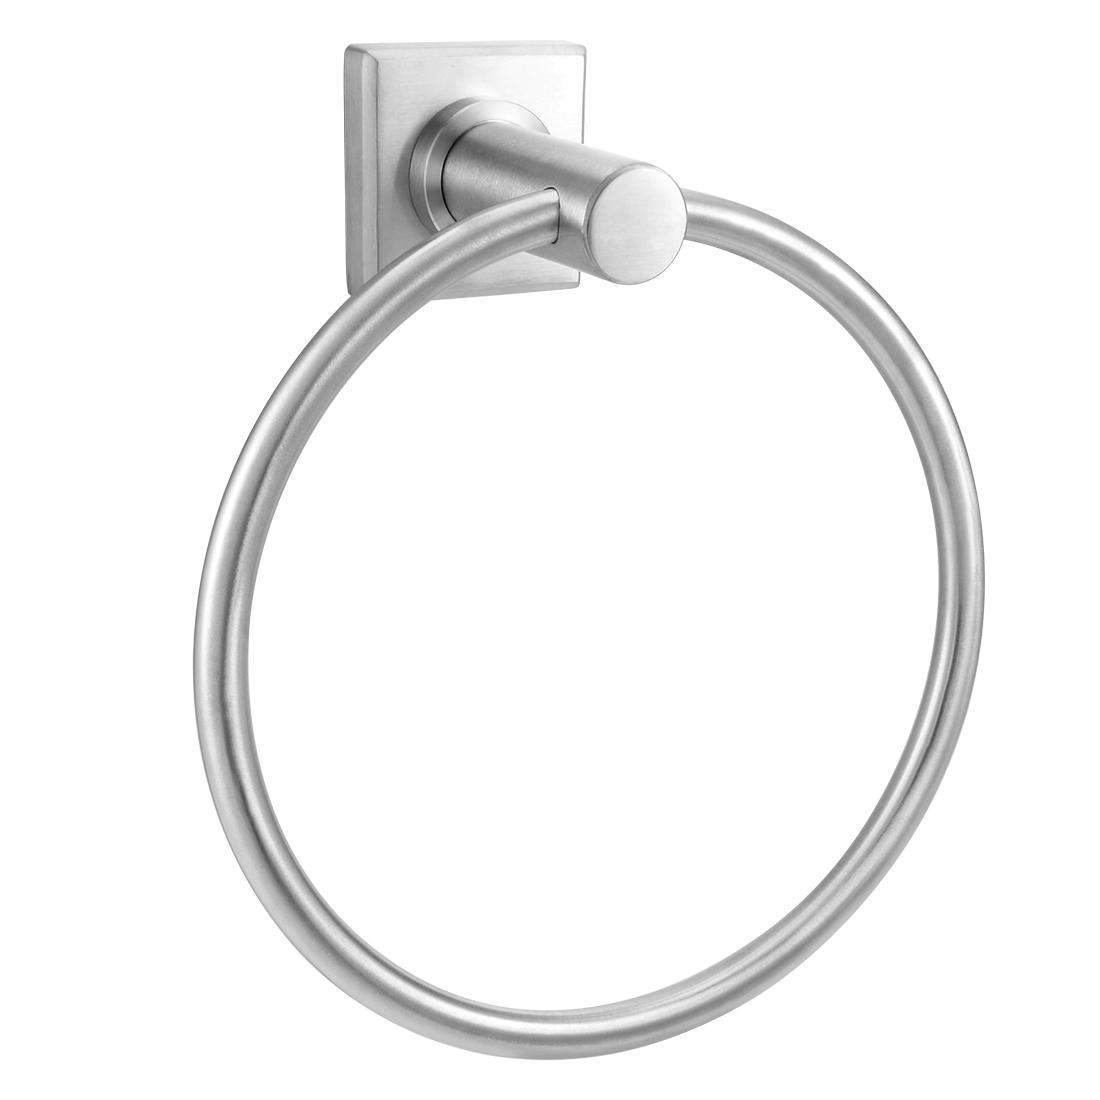 304 Stainless Steel Bathroom Towel Ring Hanger Brushed Finish